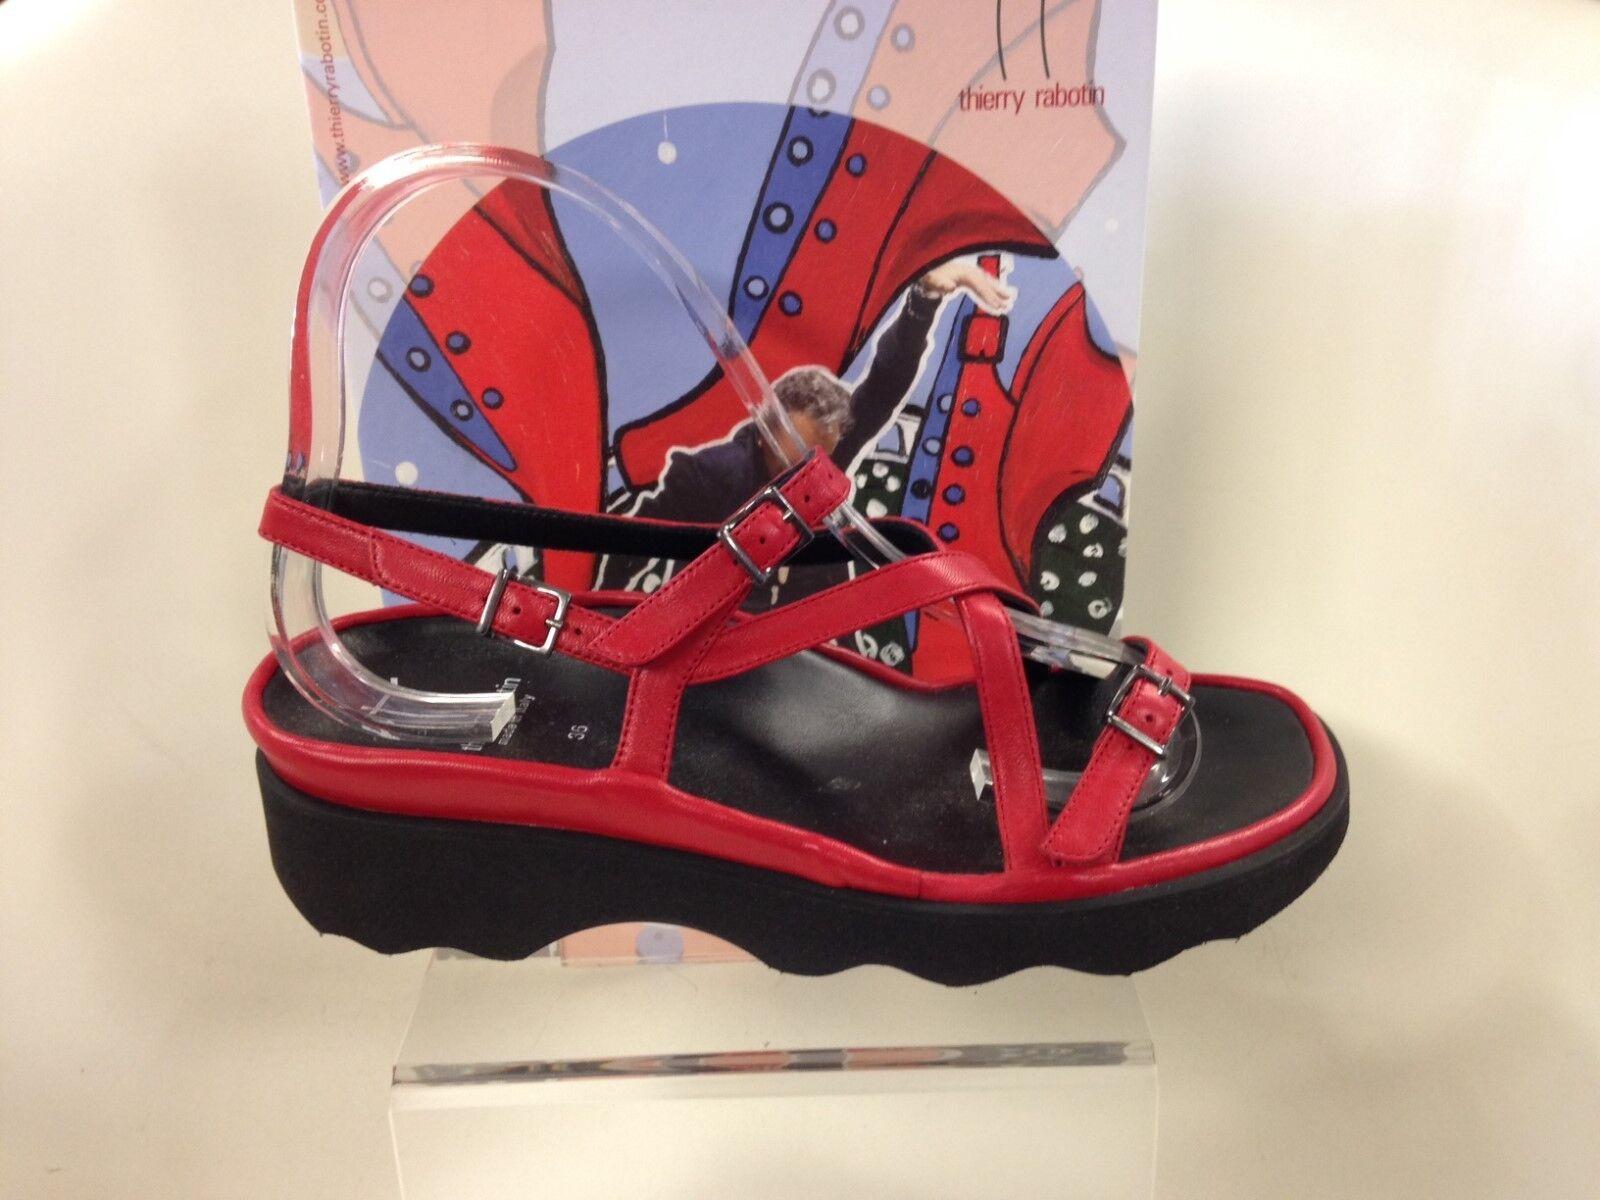 Thierry Rabotin Ondulata Fiamma Rosso Comfort Sandali Misure da Donna Donna Donna 36-42  542109